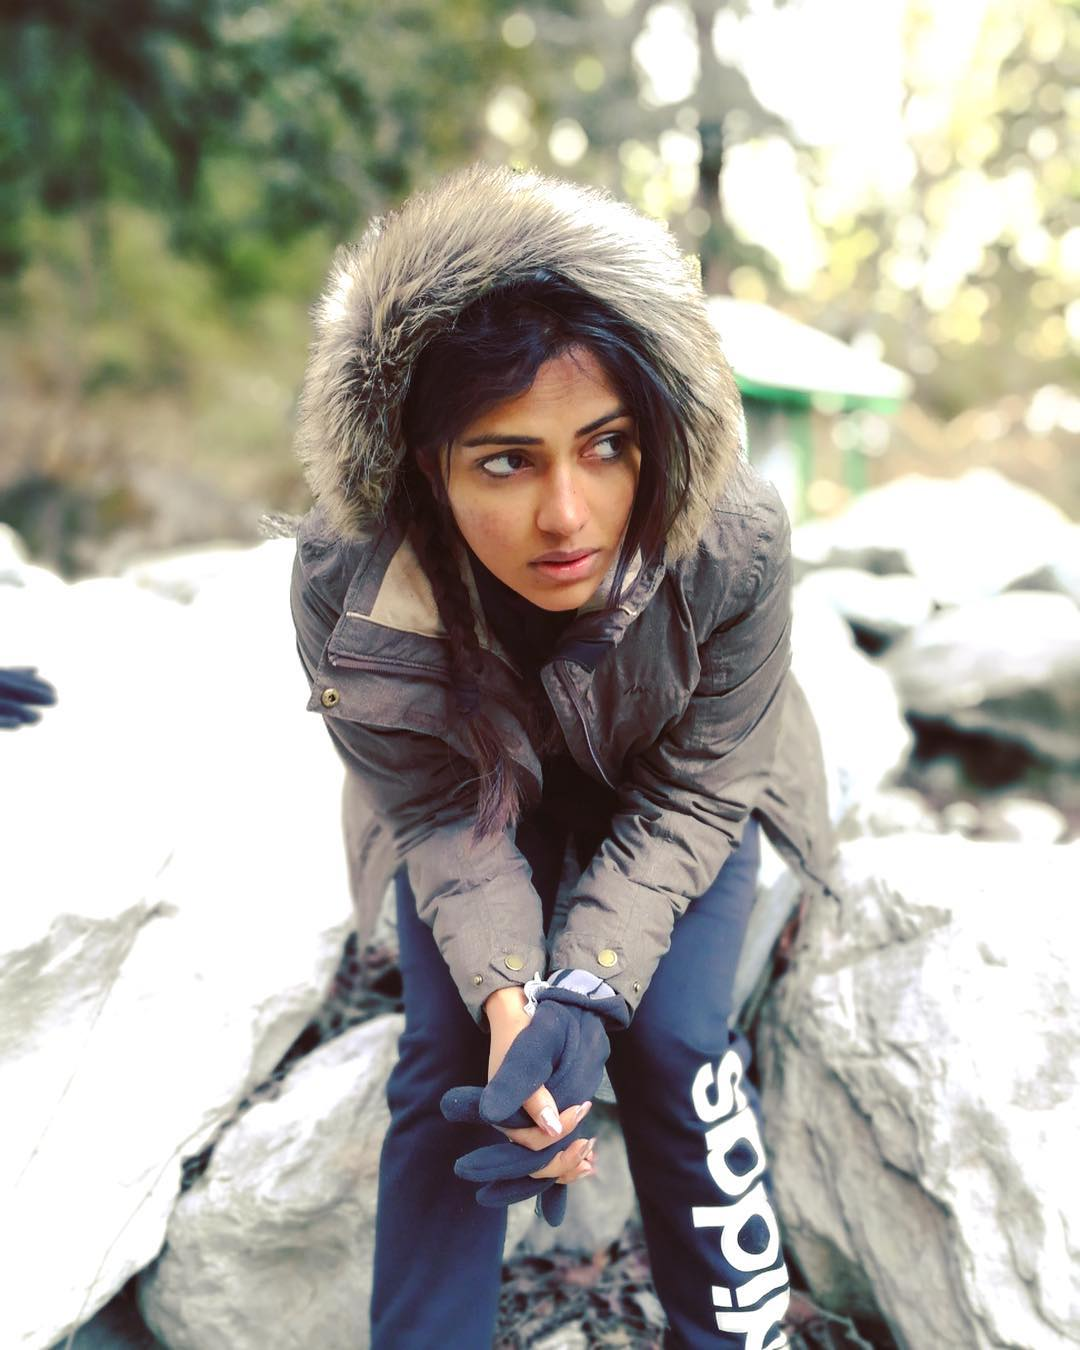 Amala Paul Photos | Amala Paul Images - HD Actress Photo